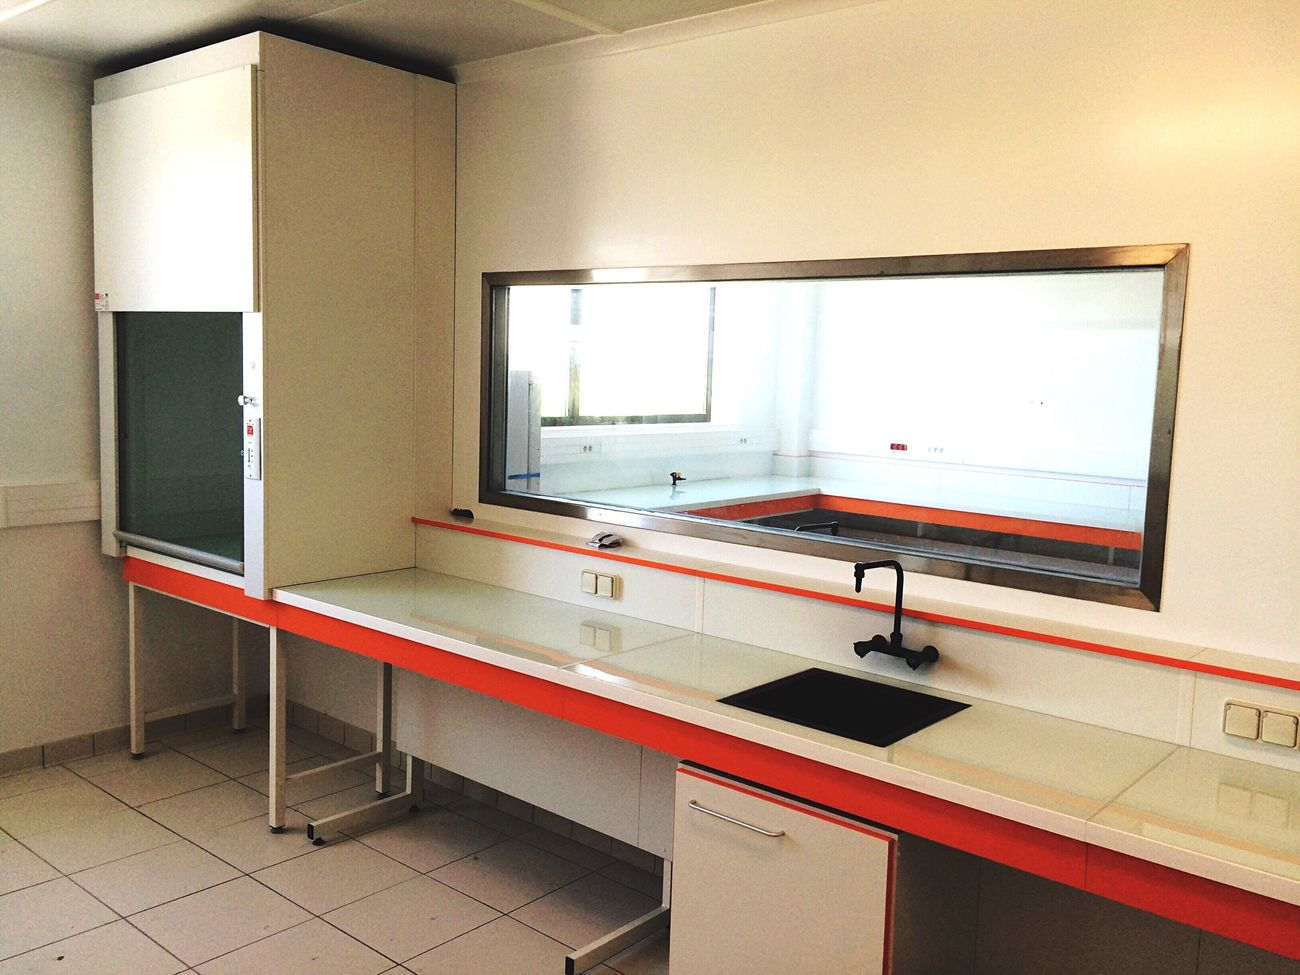 Sarlrenaudetfils Paillassesdelaboratoire Laboratoire Agencement Agencementdelaboratoire Lorraine Alsace Sorbonne